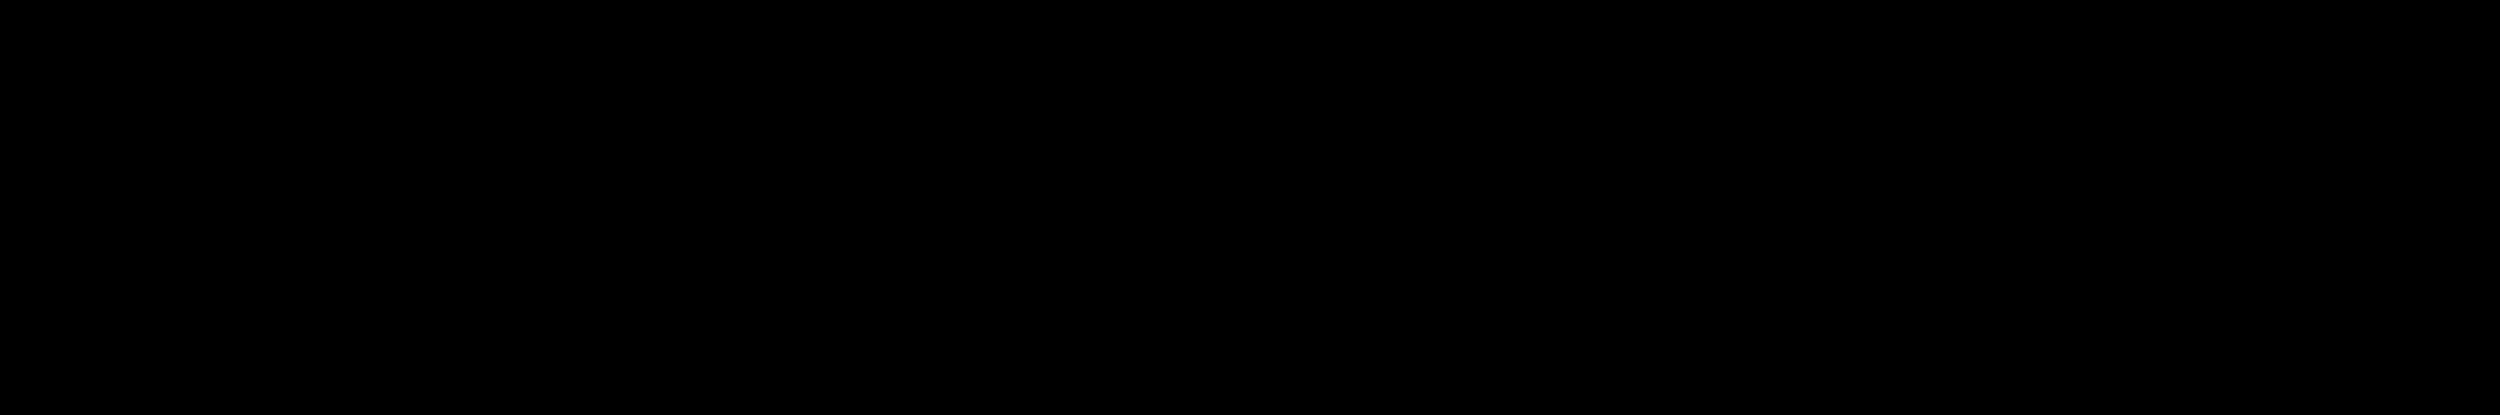 Chicago_Tribune_logo_black.png